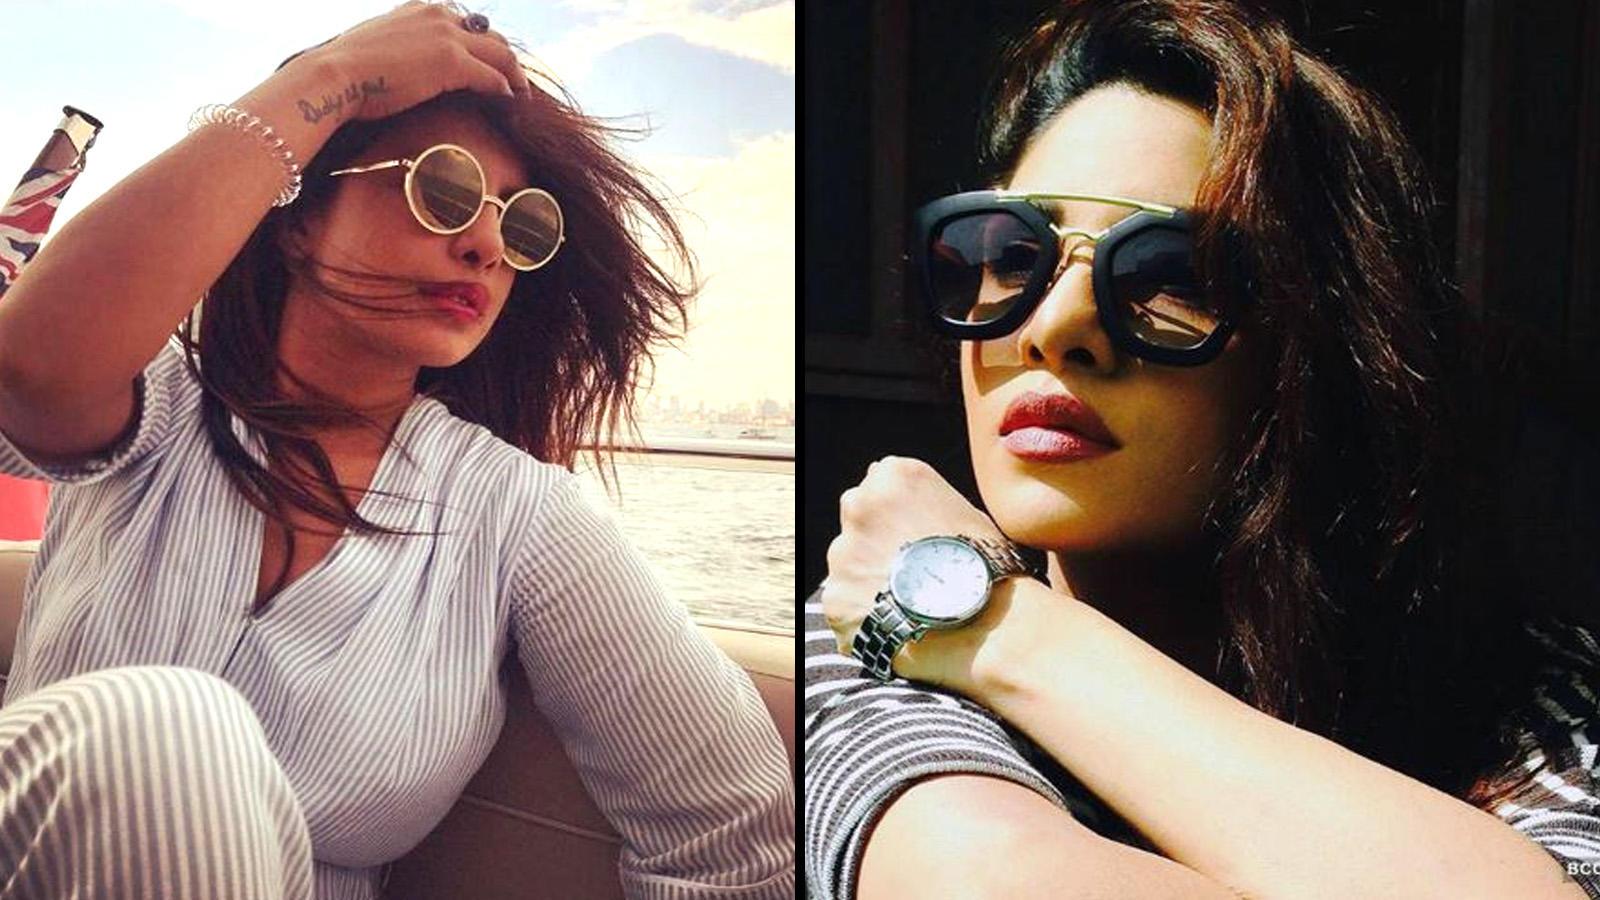 She is called Pakistan's Priyanka Chopra: Meet Zhalay Sarhadi